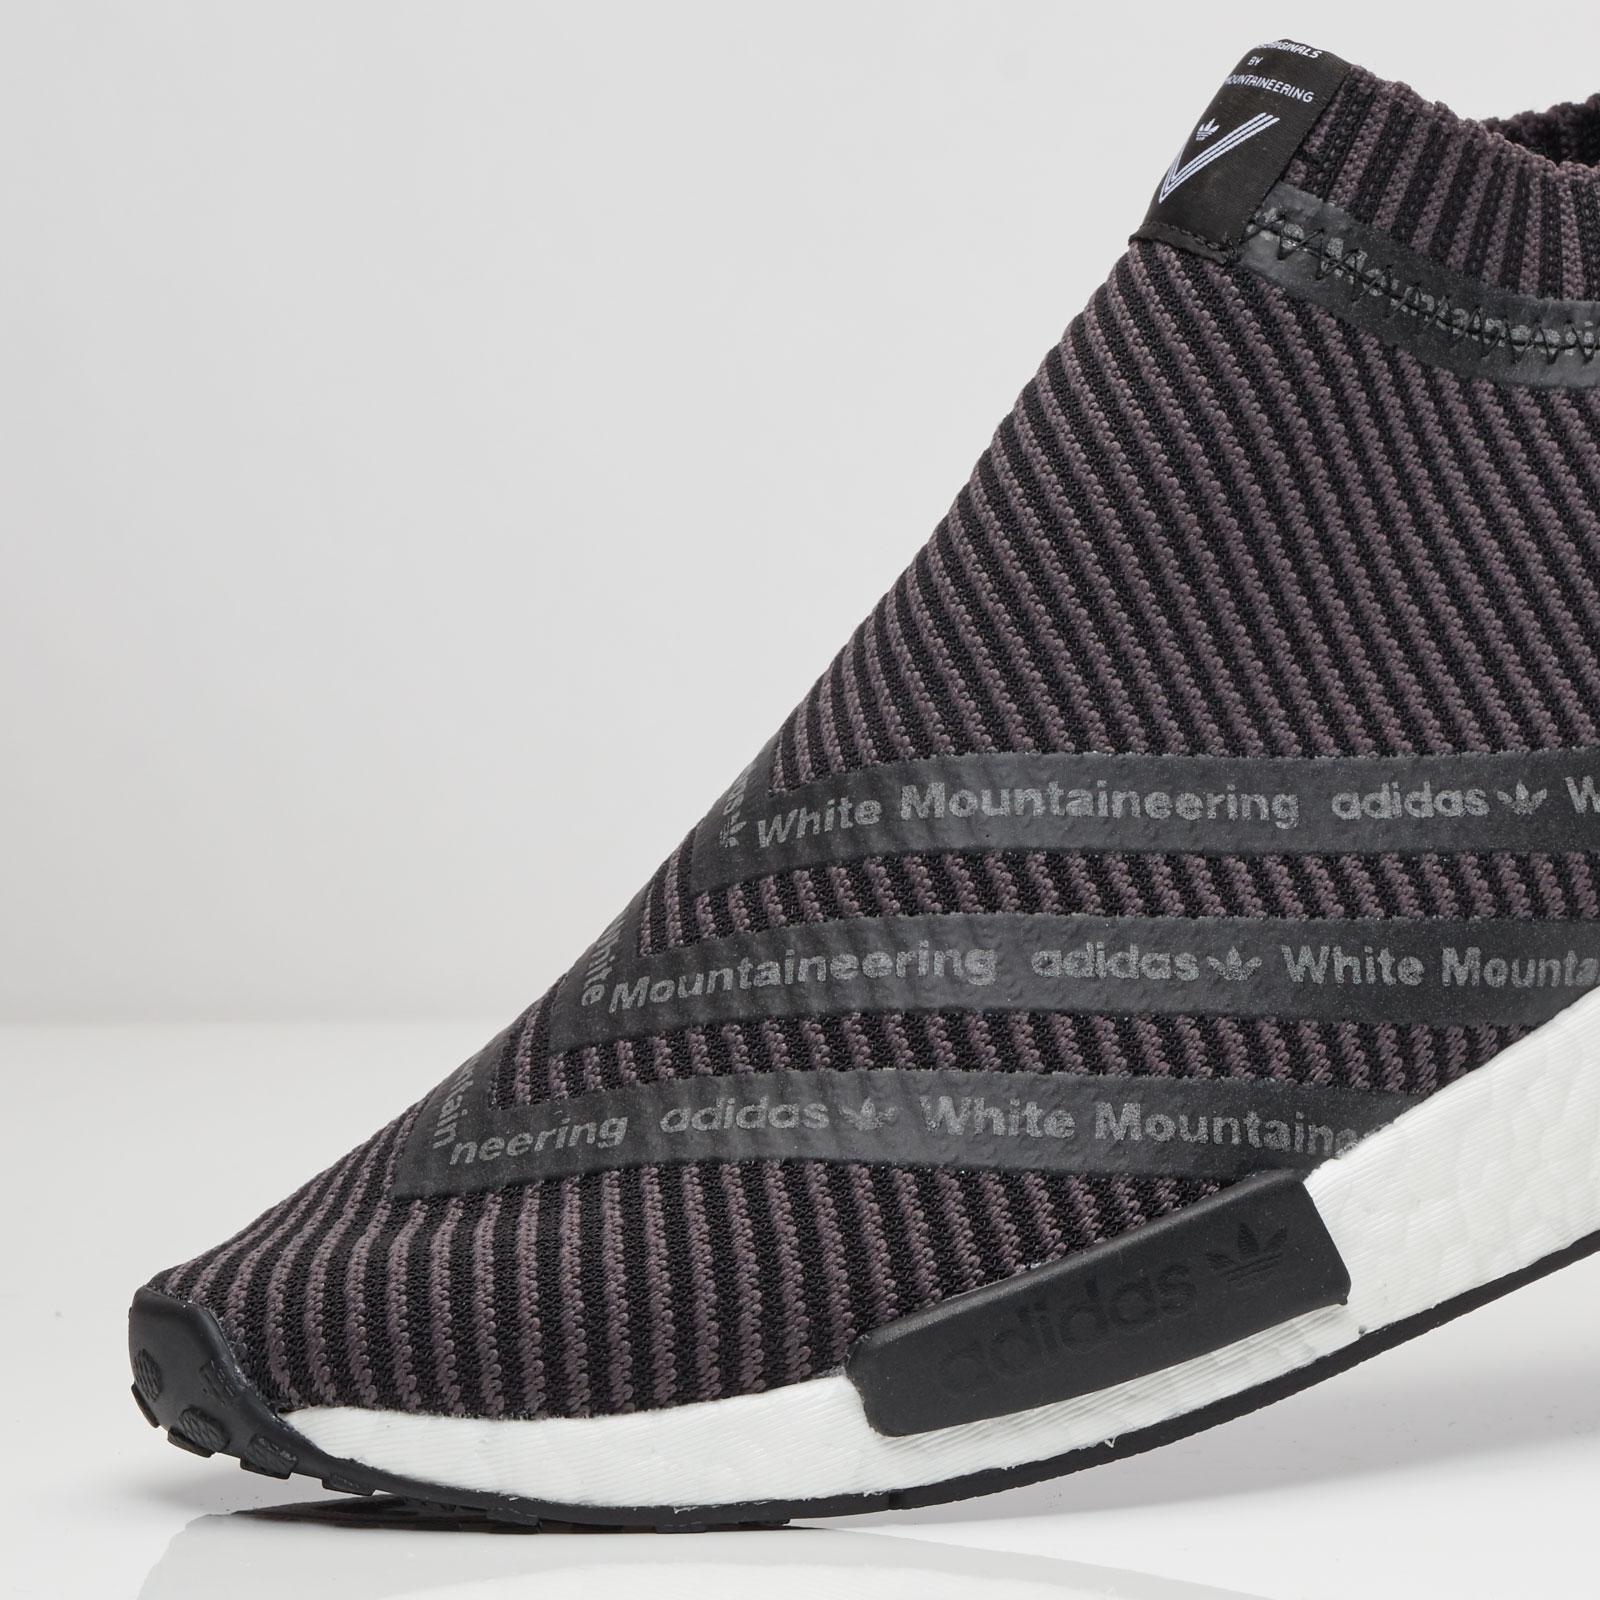 adidas wm nmd città sock s80529 sneakersnstuff scarpe